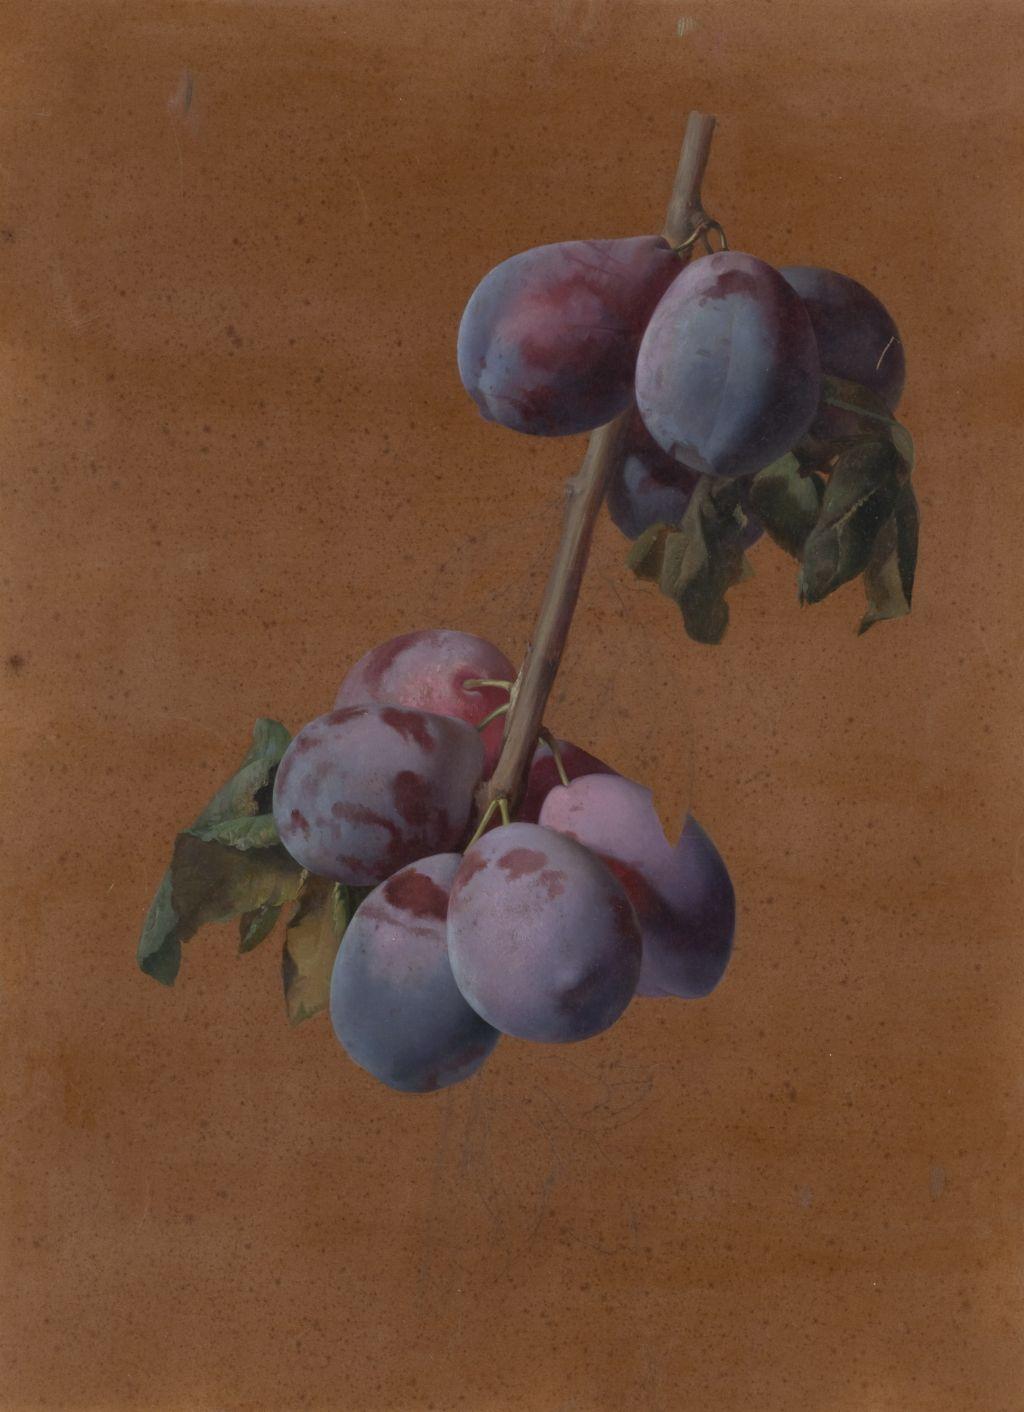 Branca amb prunes, Josep Mirabent